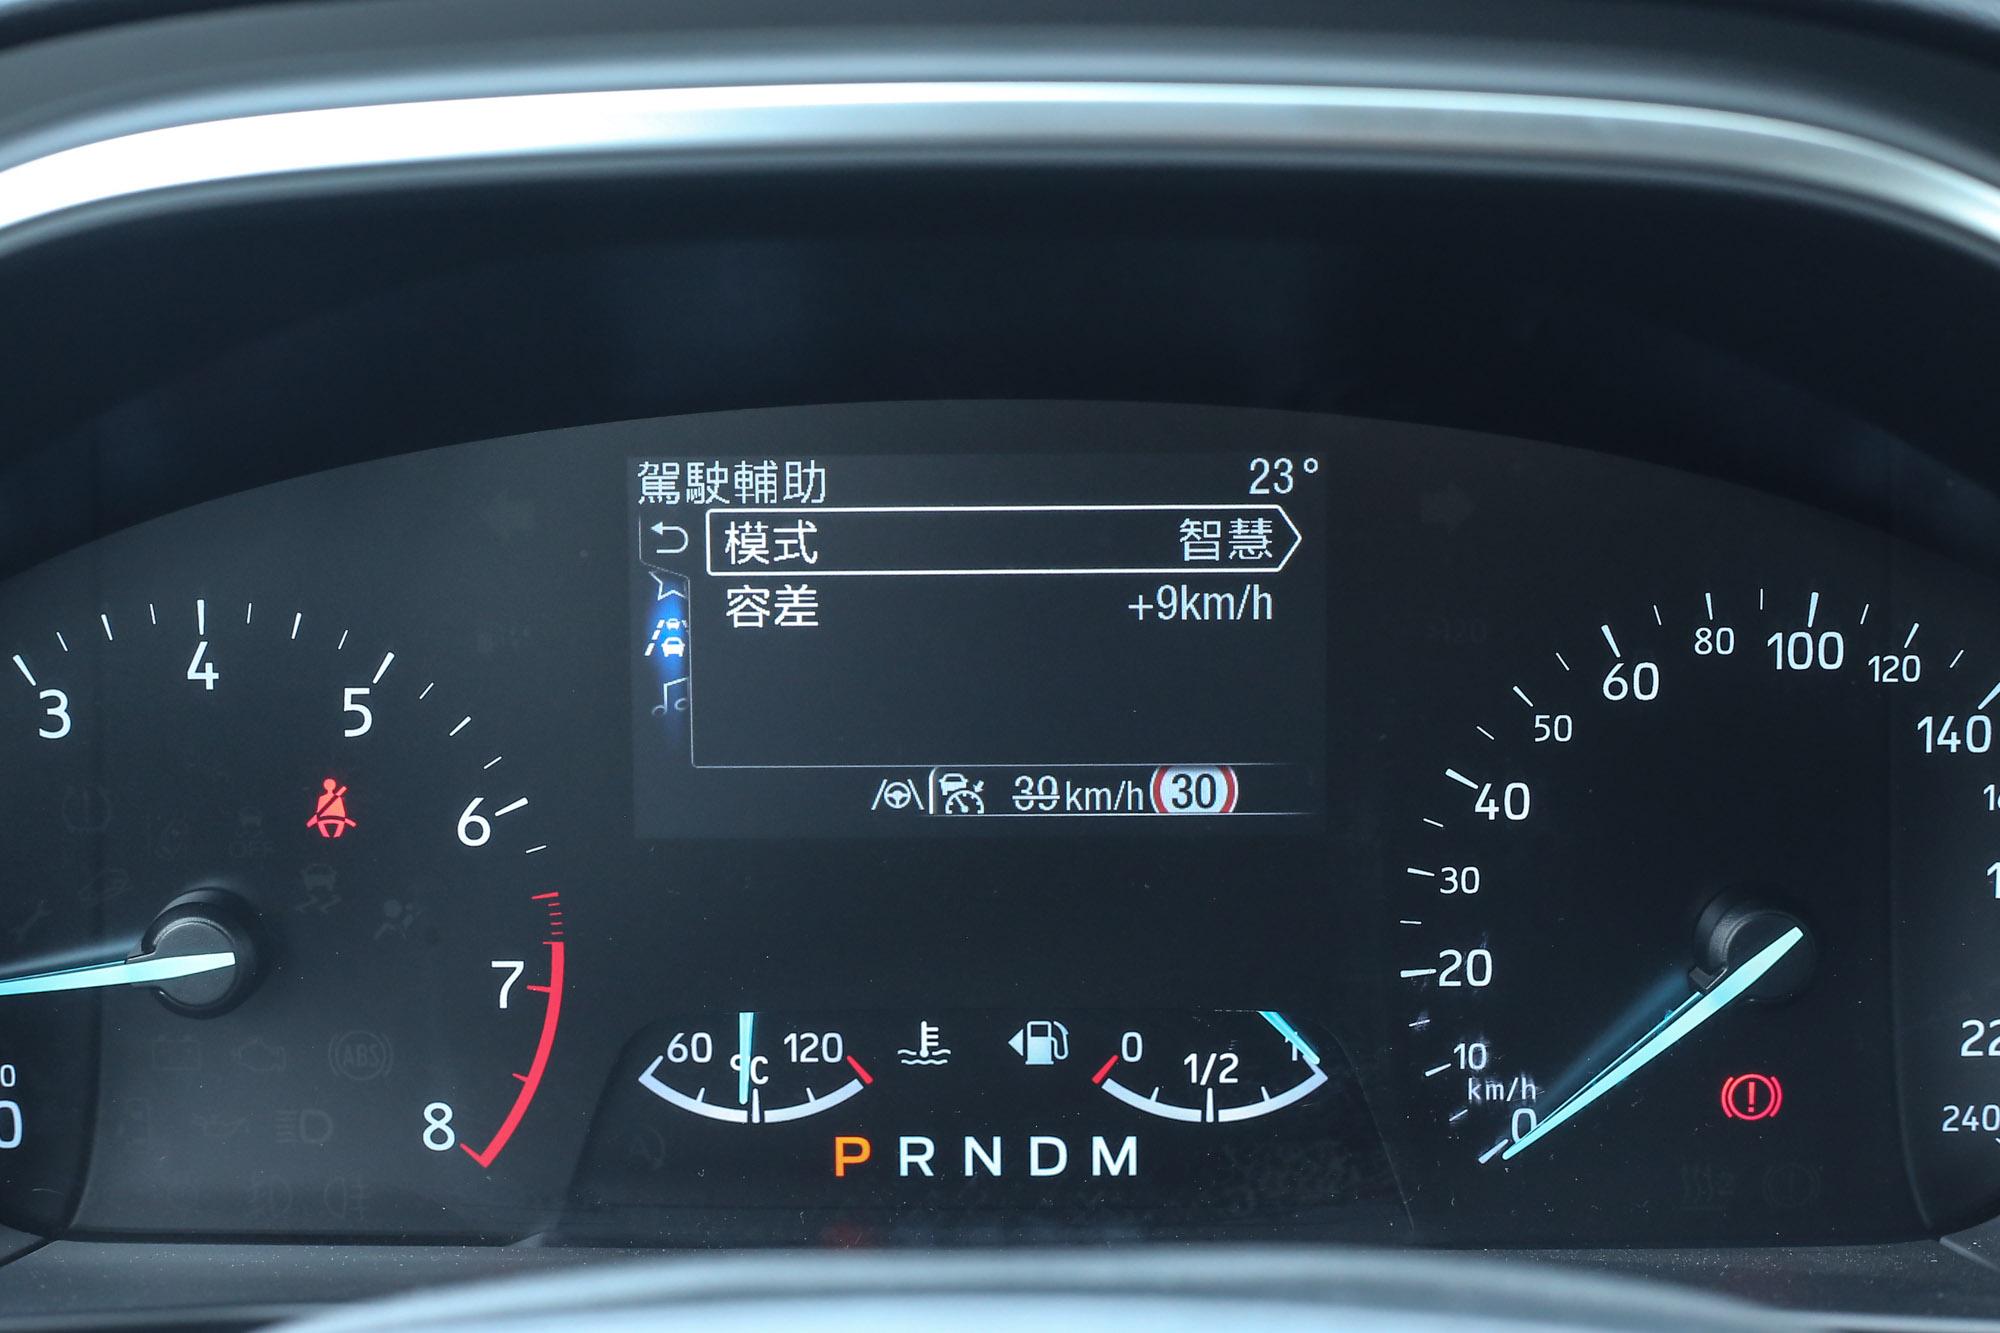 ISA智慧型速限輔助系統可依照道路速限調整車速的功能,保有10km/h的容差緩衝。